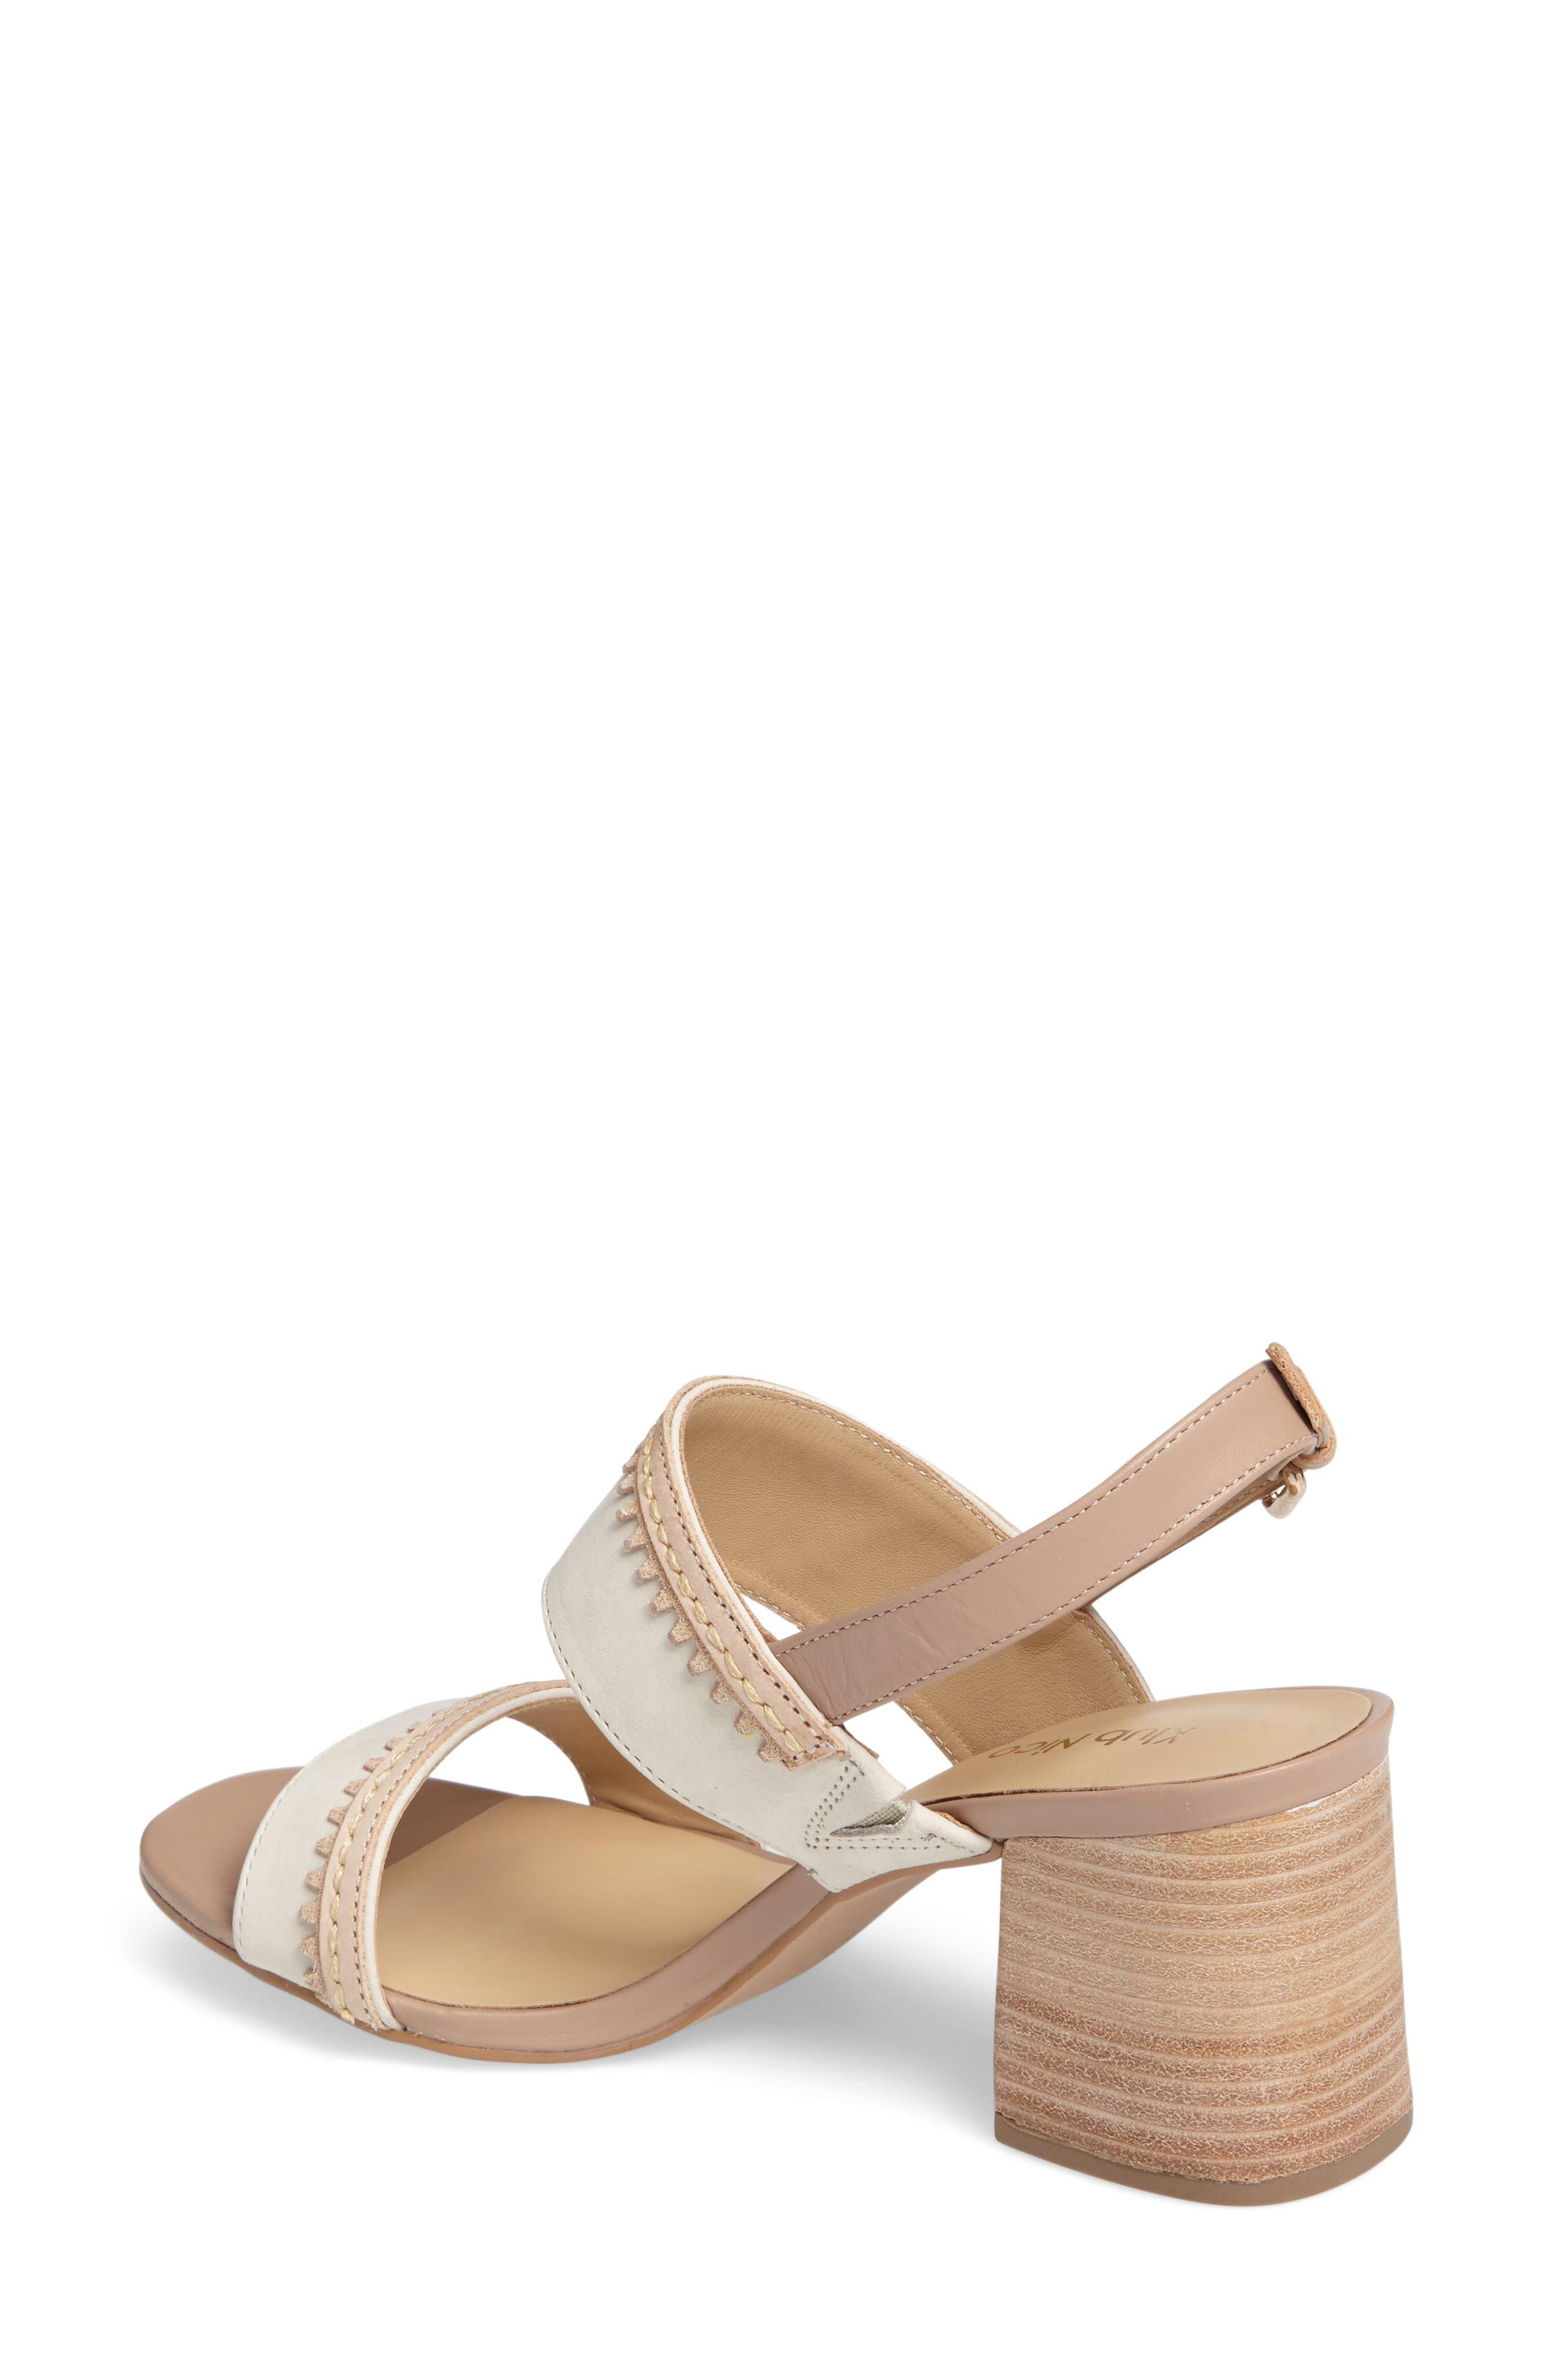 Rycca Block Heel Sandal,                             Alternate thumbnail 5, color,